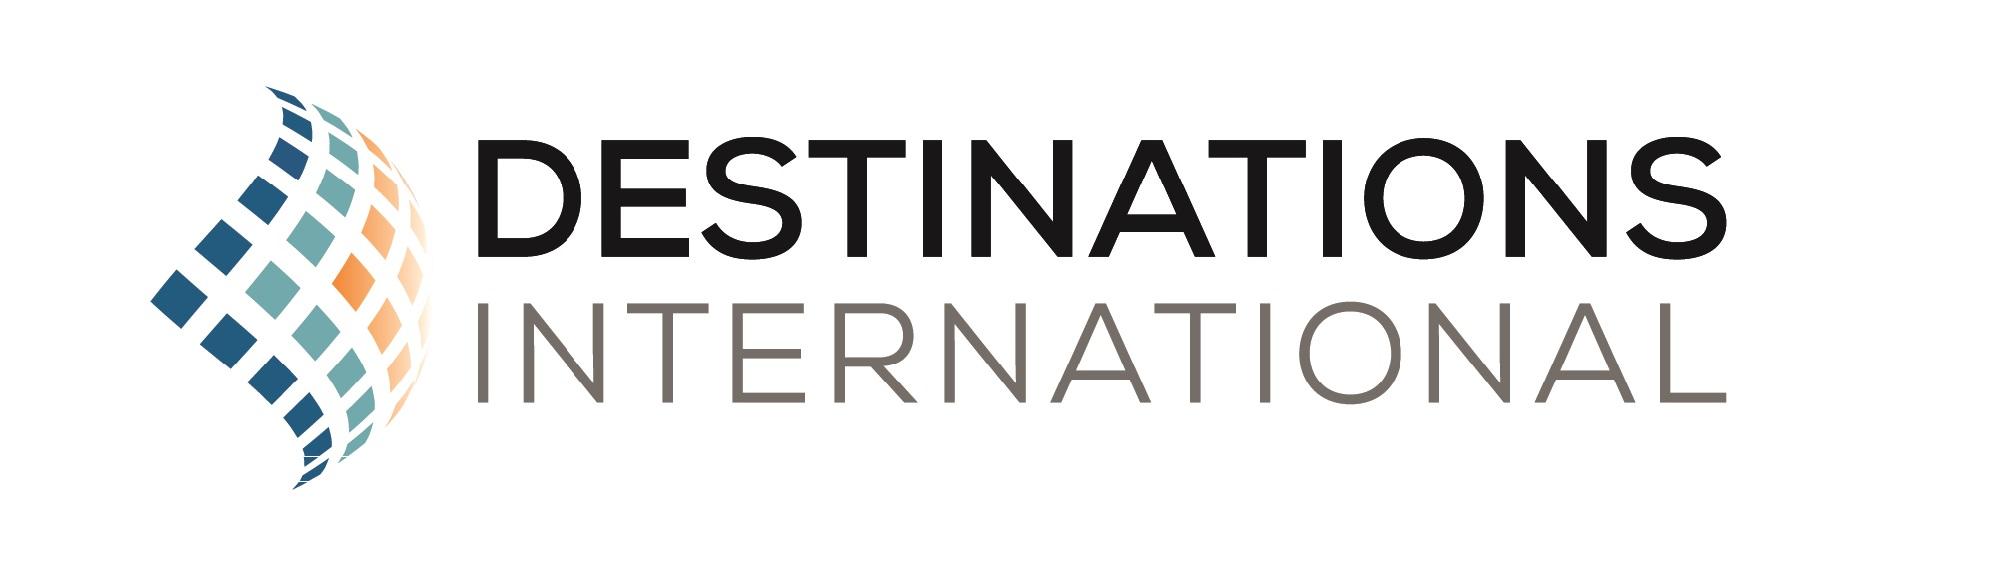 Destinations International Logo Edit.jpg